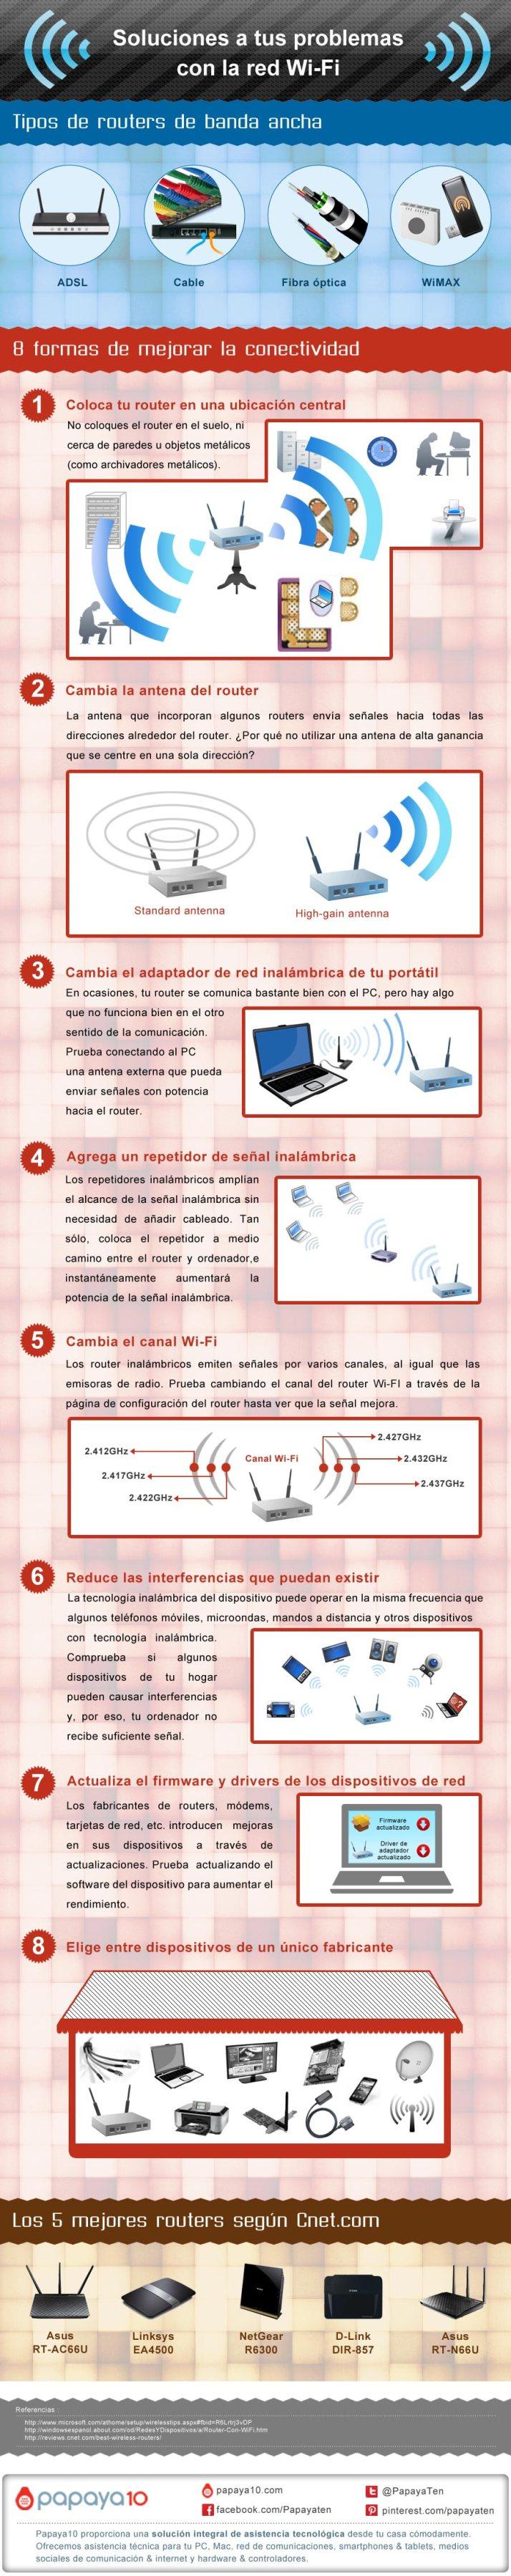 8 consejos para mejorar tu red WiFi